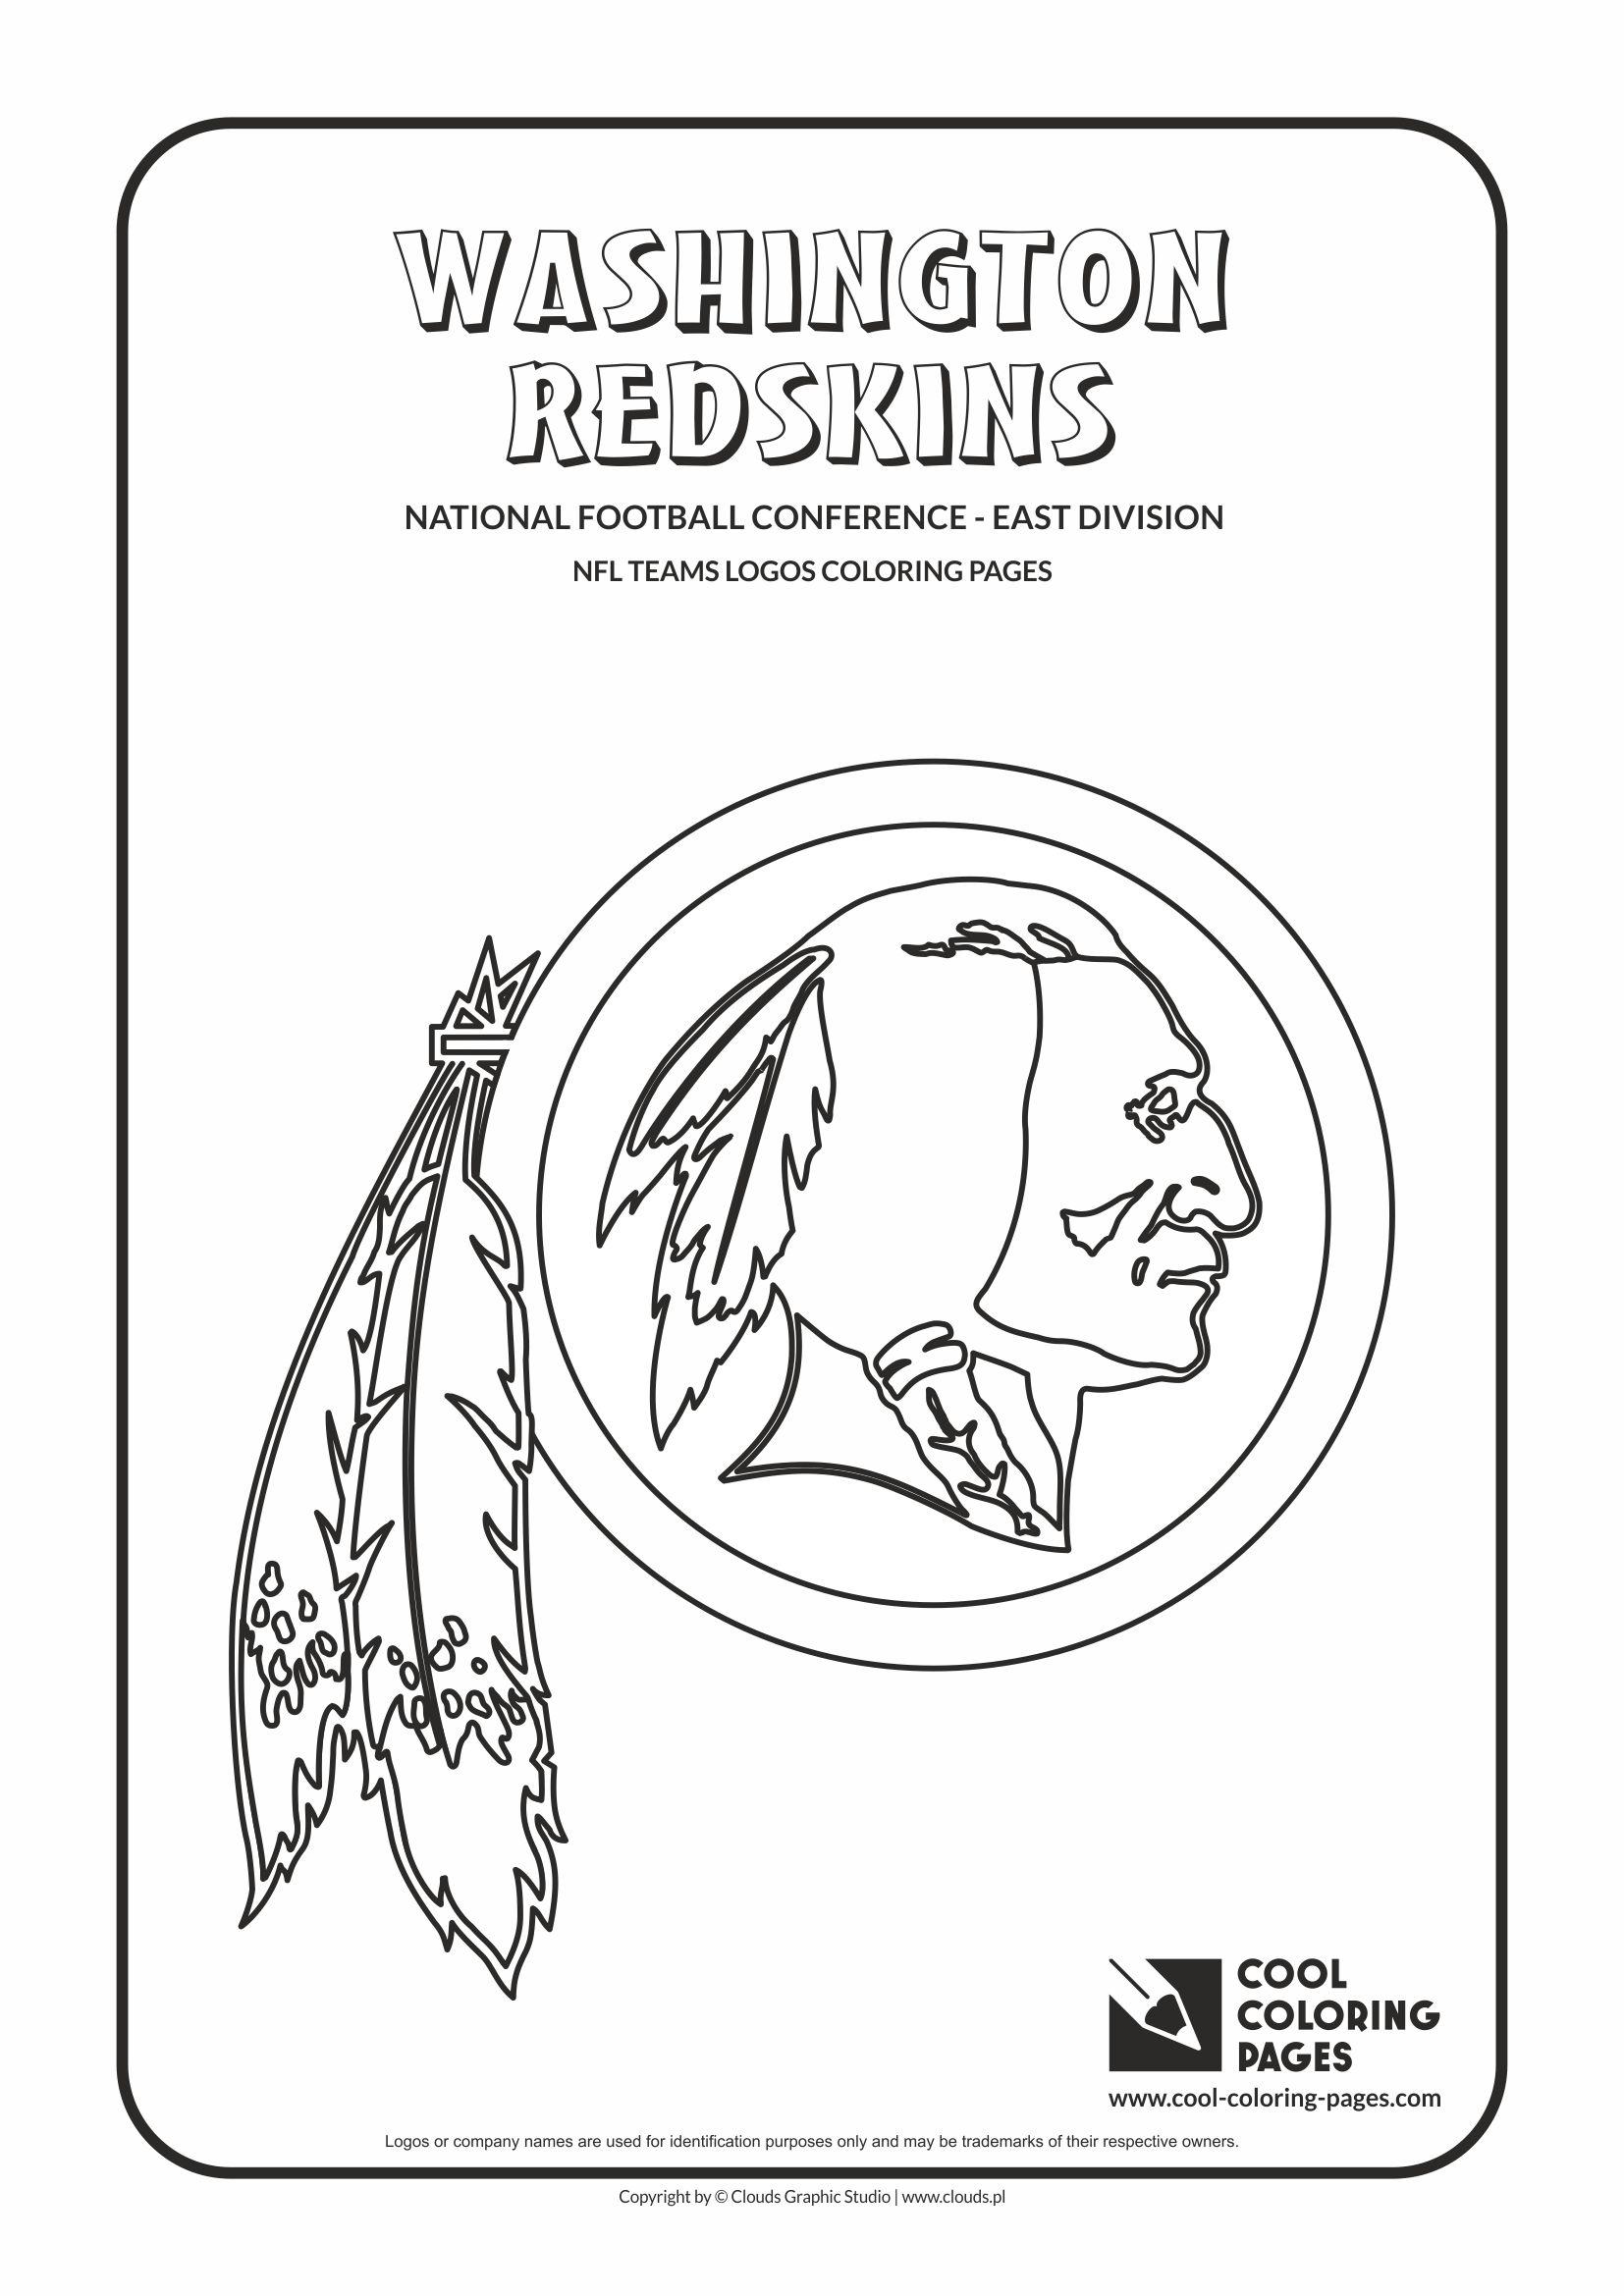 Washington Redskins € Nfl American Football Teams Logos Coloring